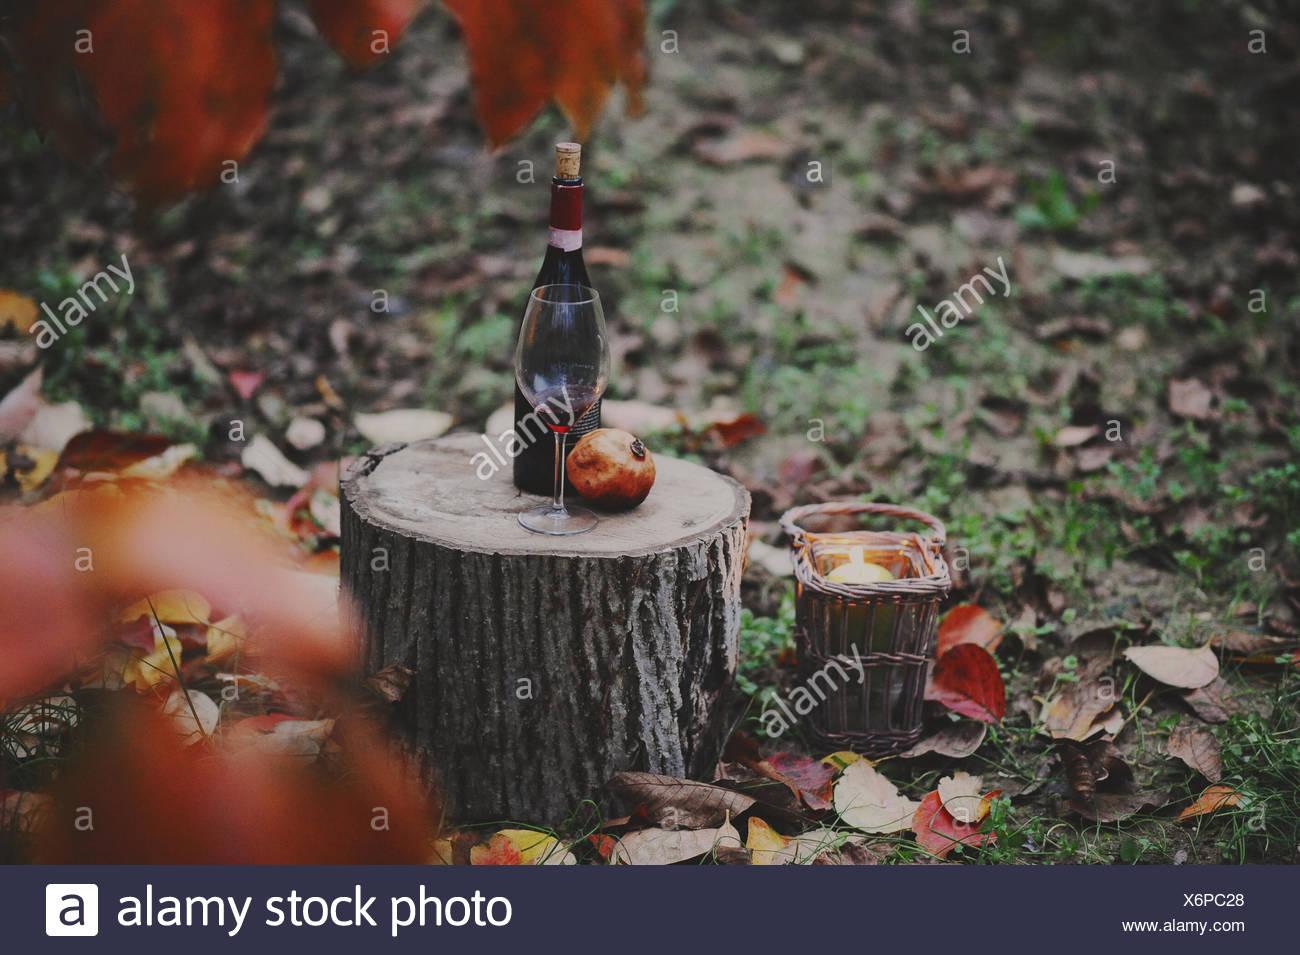 Italia, Piedmont, Tortona, Still life with bottle of red wine, Glass and pomegranate in autumn scene - Stock Image